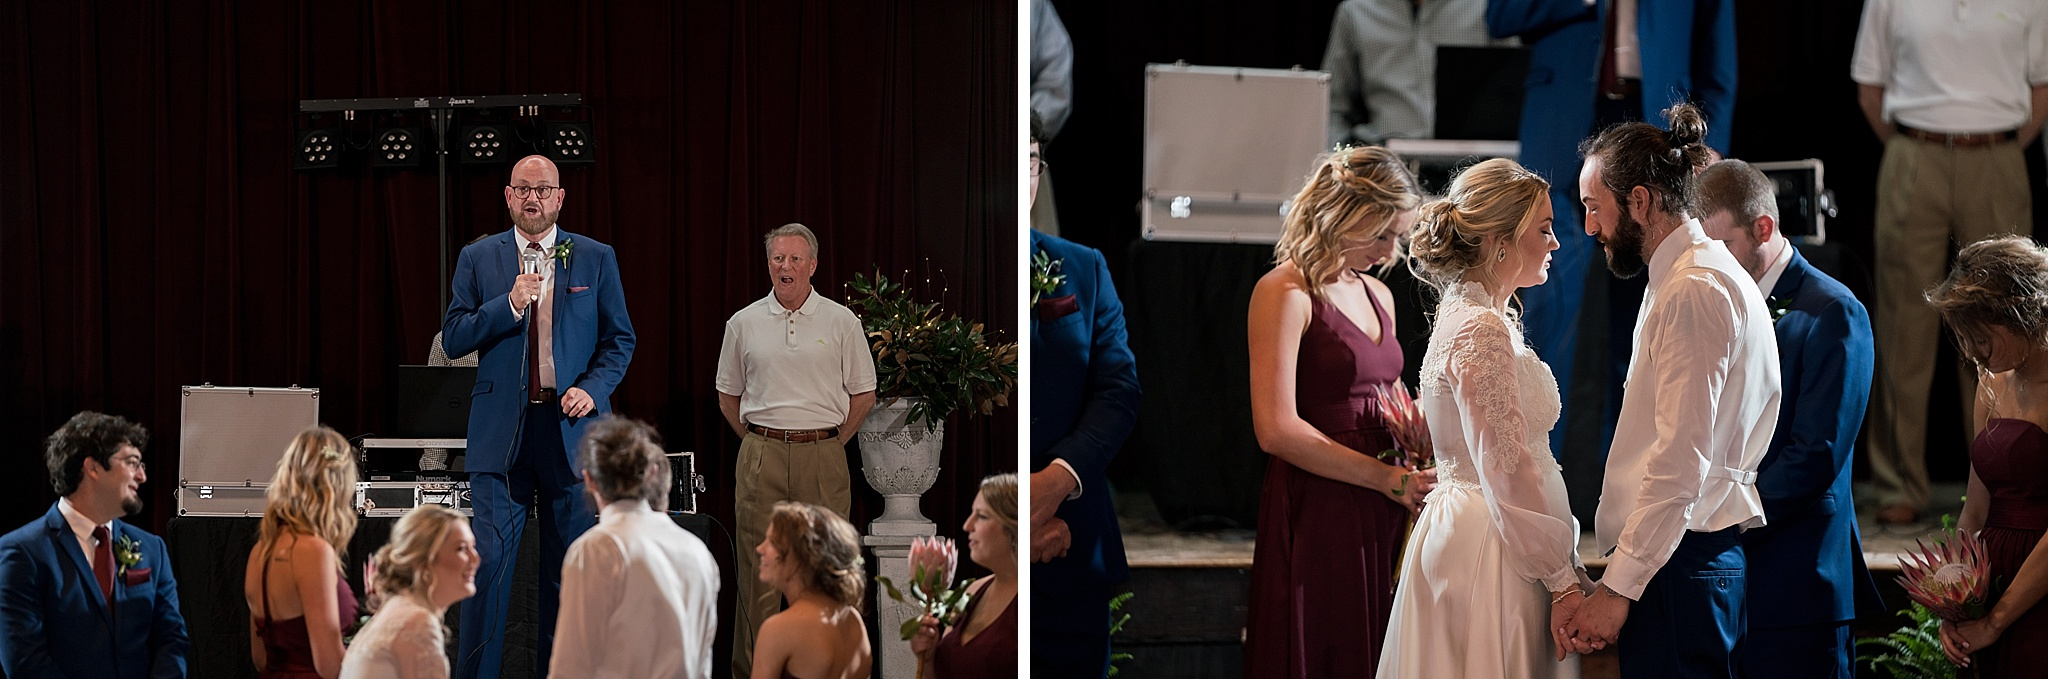 Washington-NC-Wedding-Photography-218.jpg